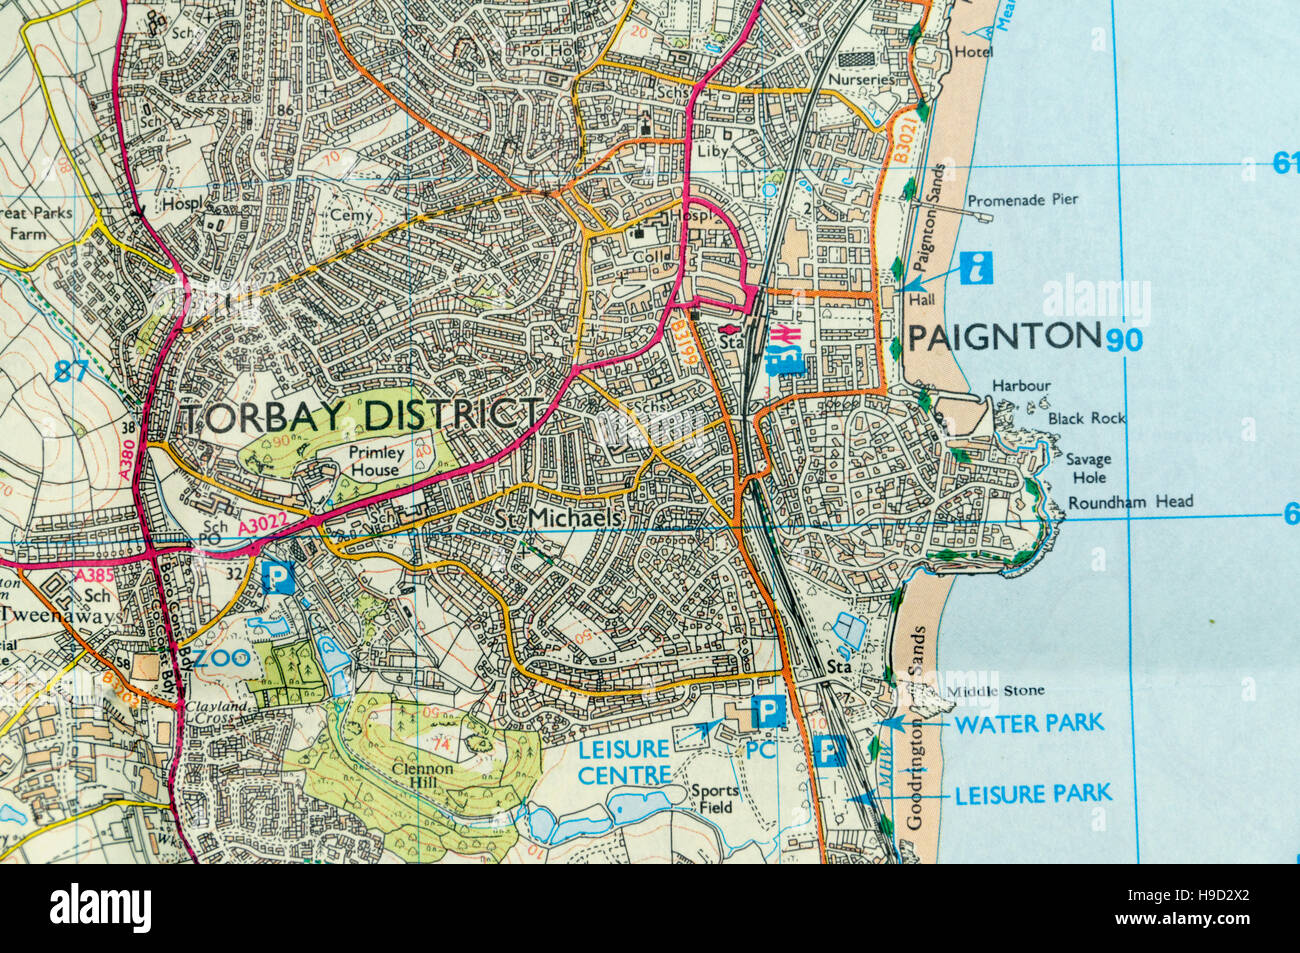 Map Of Paignton Ordnance Survey Map of Paignton, England Stock Photo: 126292154  Map Of Paignton